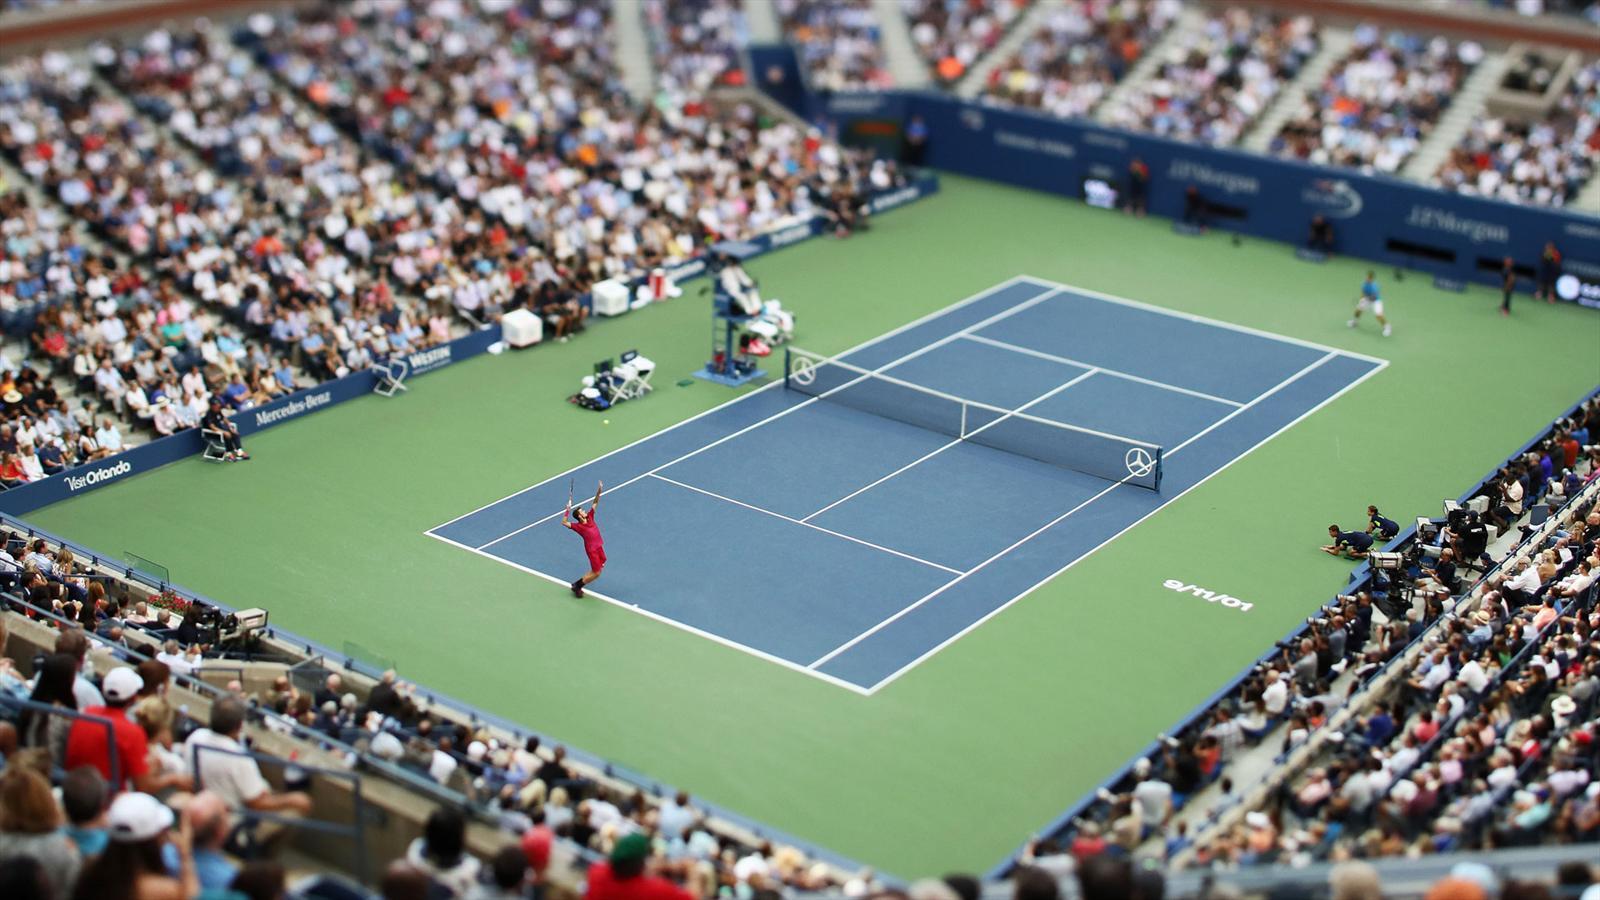 Calendario ATP 2018 - Fechas Australian Open, Roland Garros, Wimbledon y US Open - Tenis ...